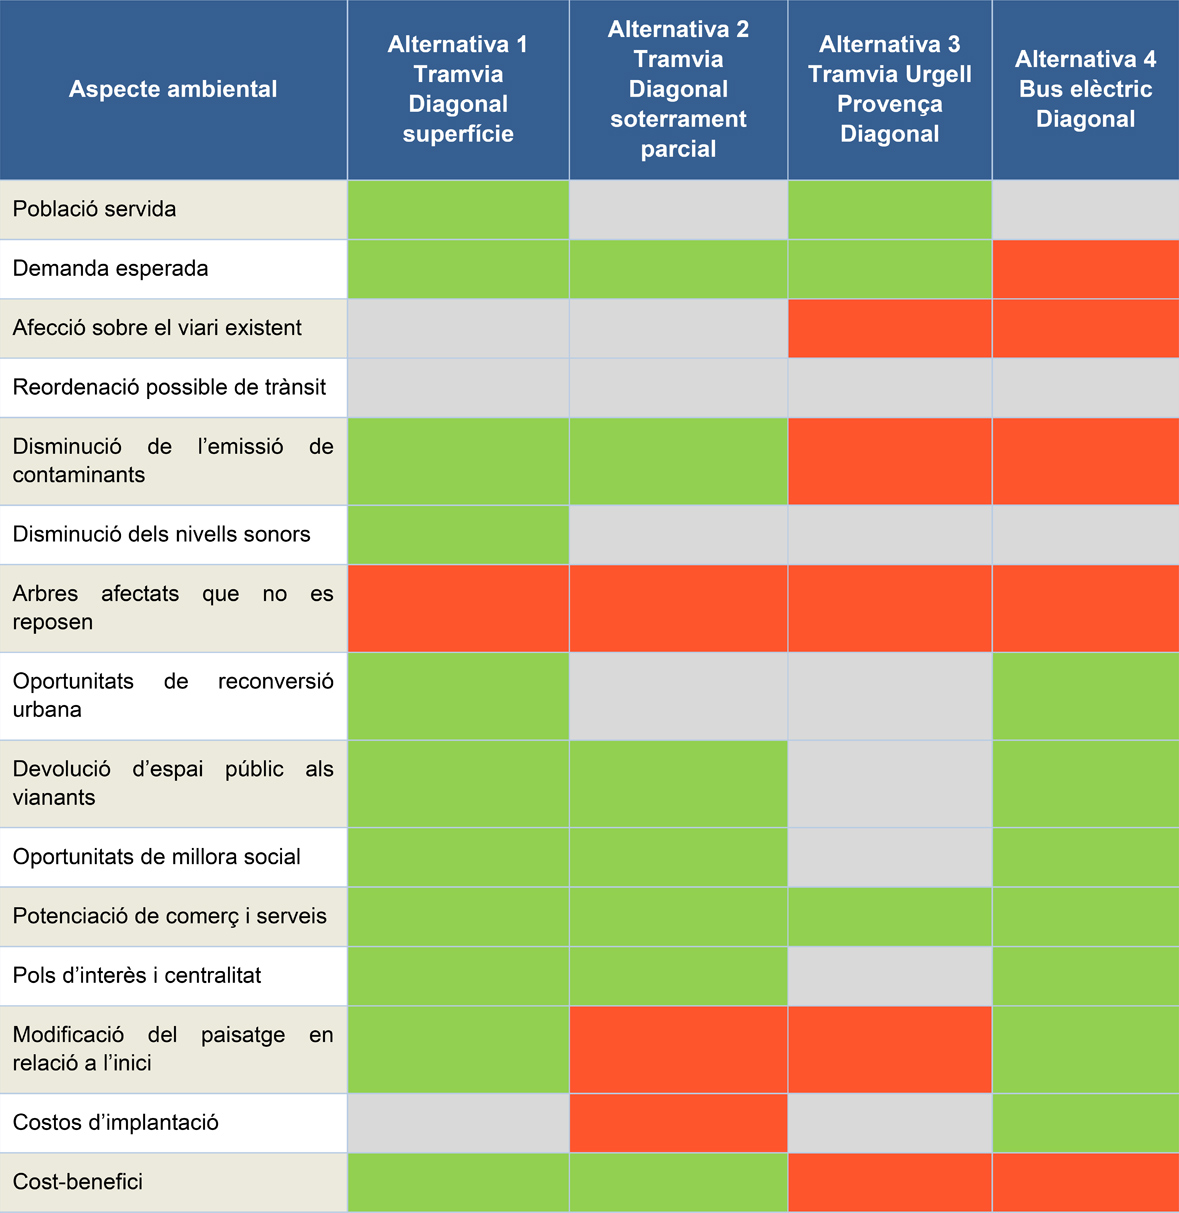 Taula d'impacte ambiental de cada alternativa